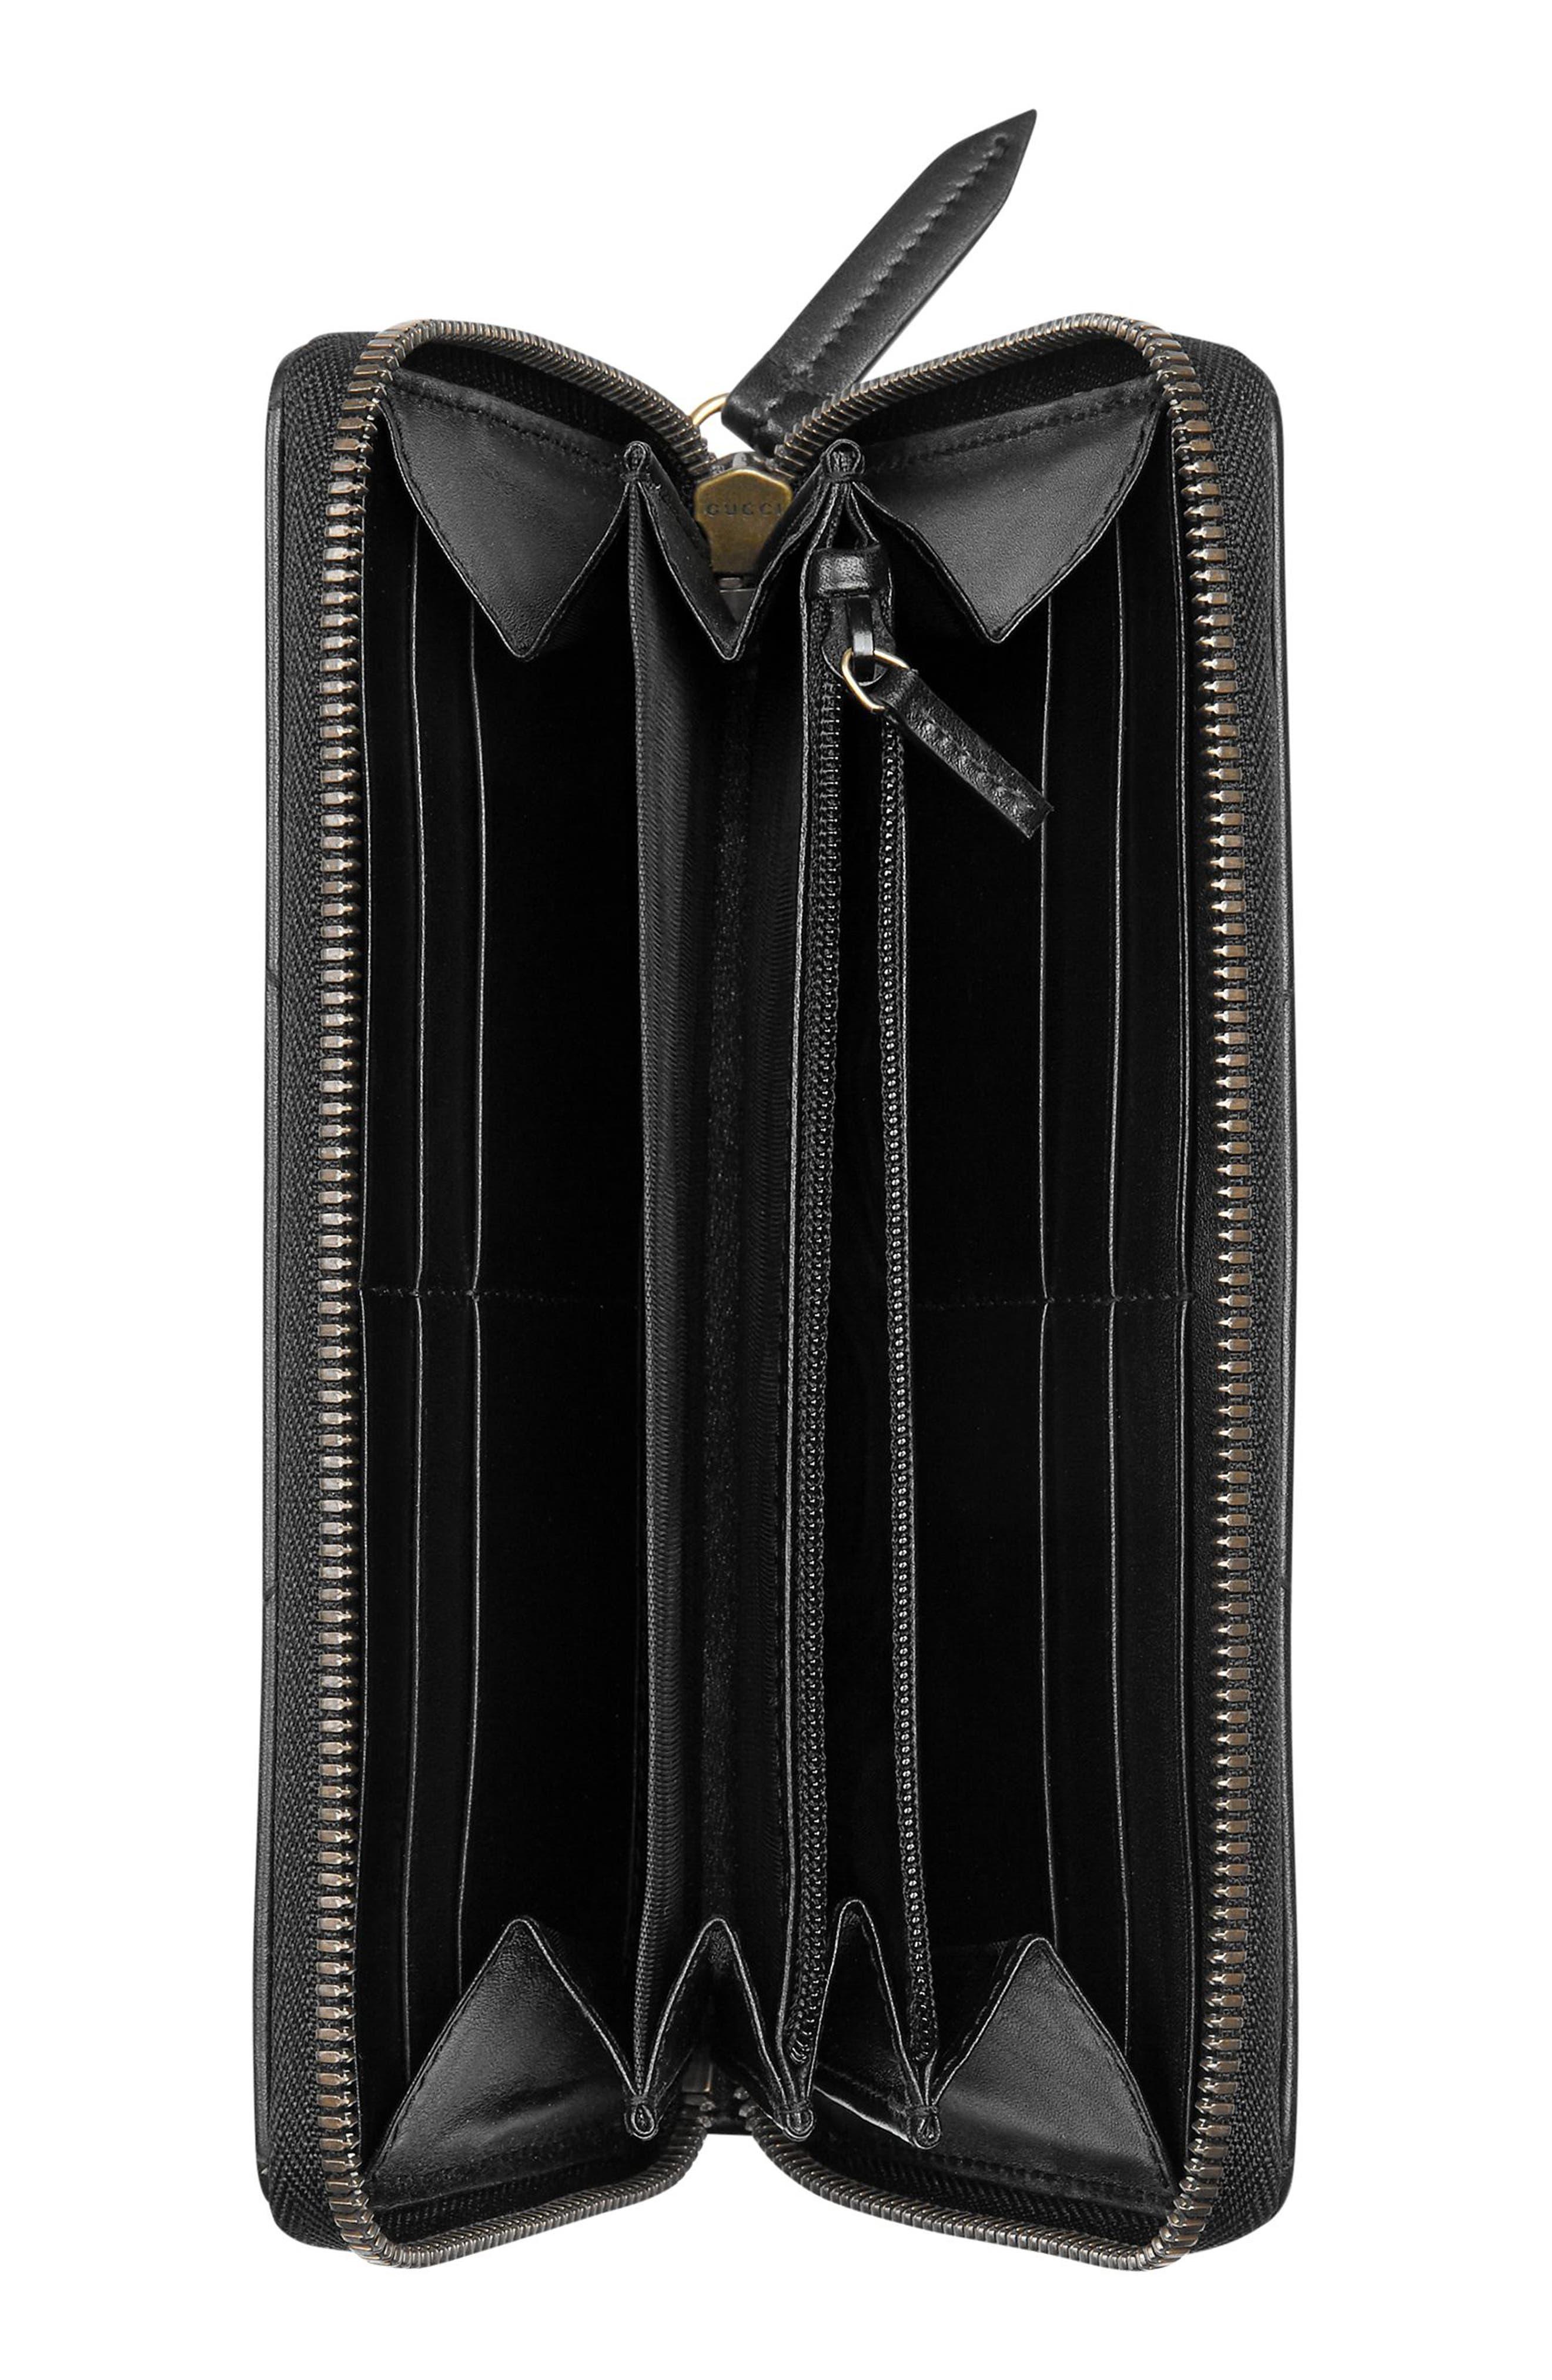 GUCCI, GG Marmont Matelassé Leather Zip-Around Wallet, Alternate thumbnail 2, color, NERO